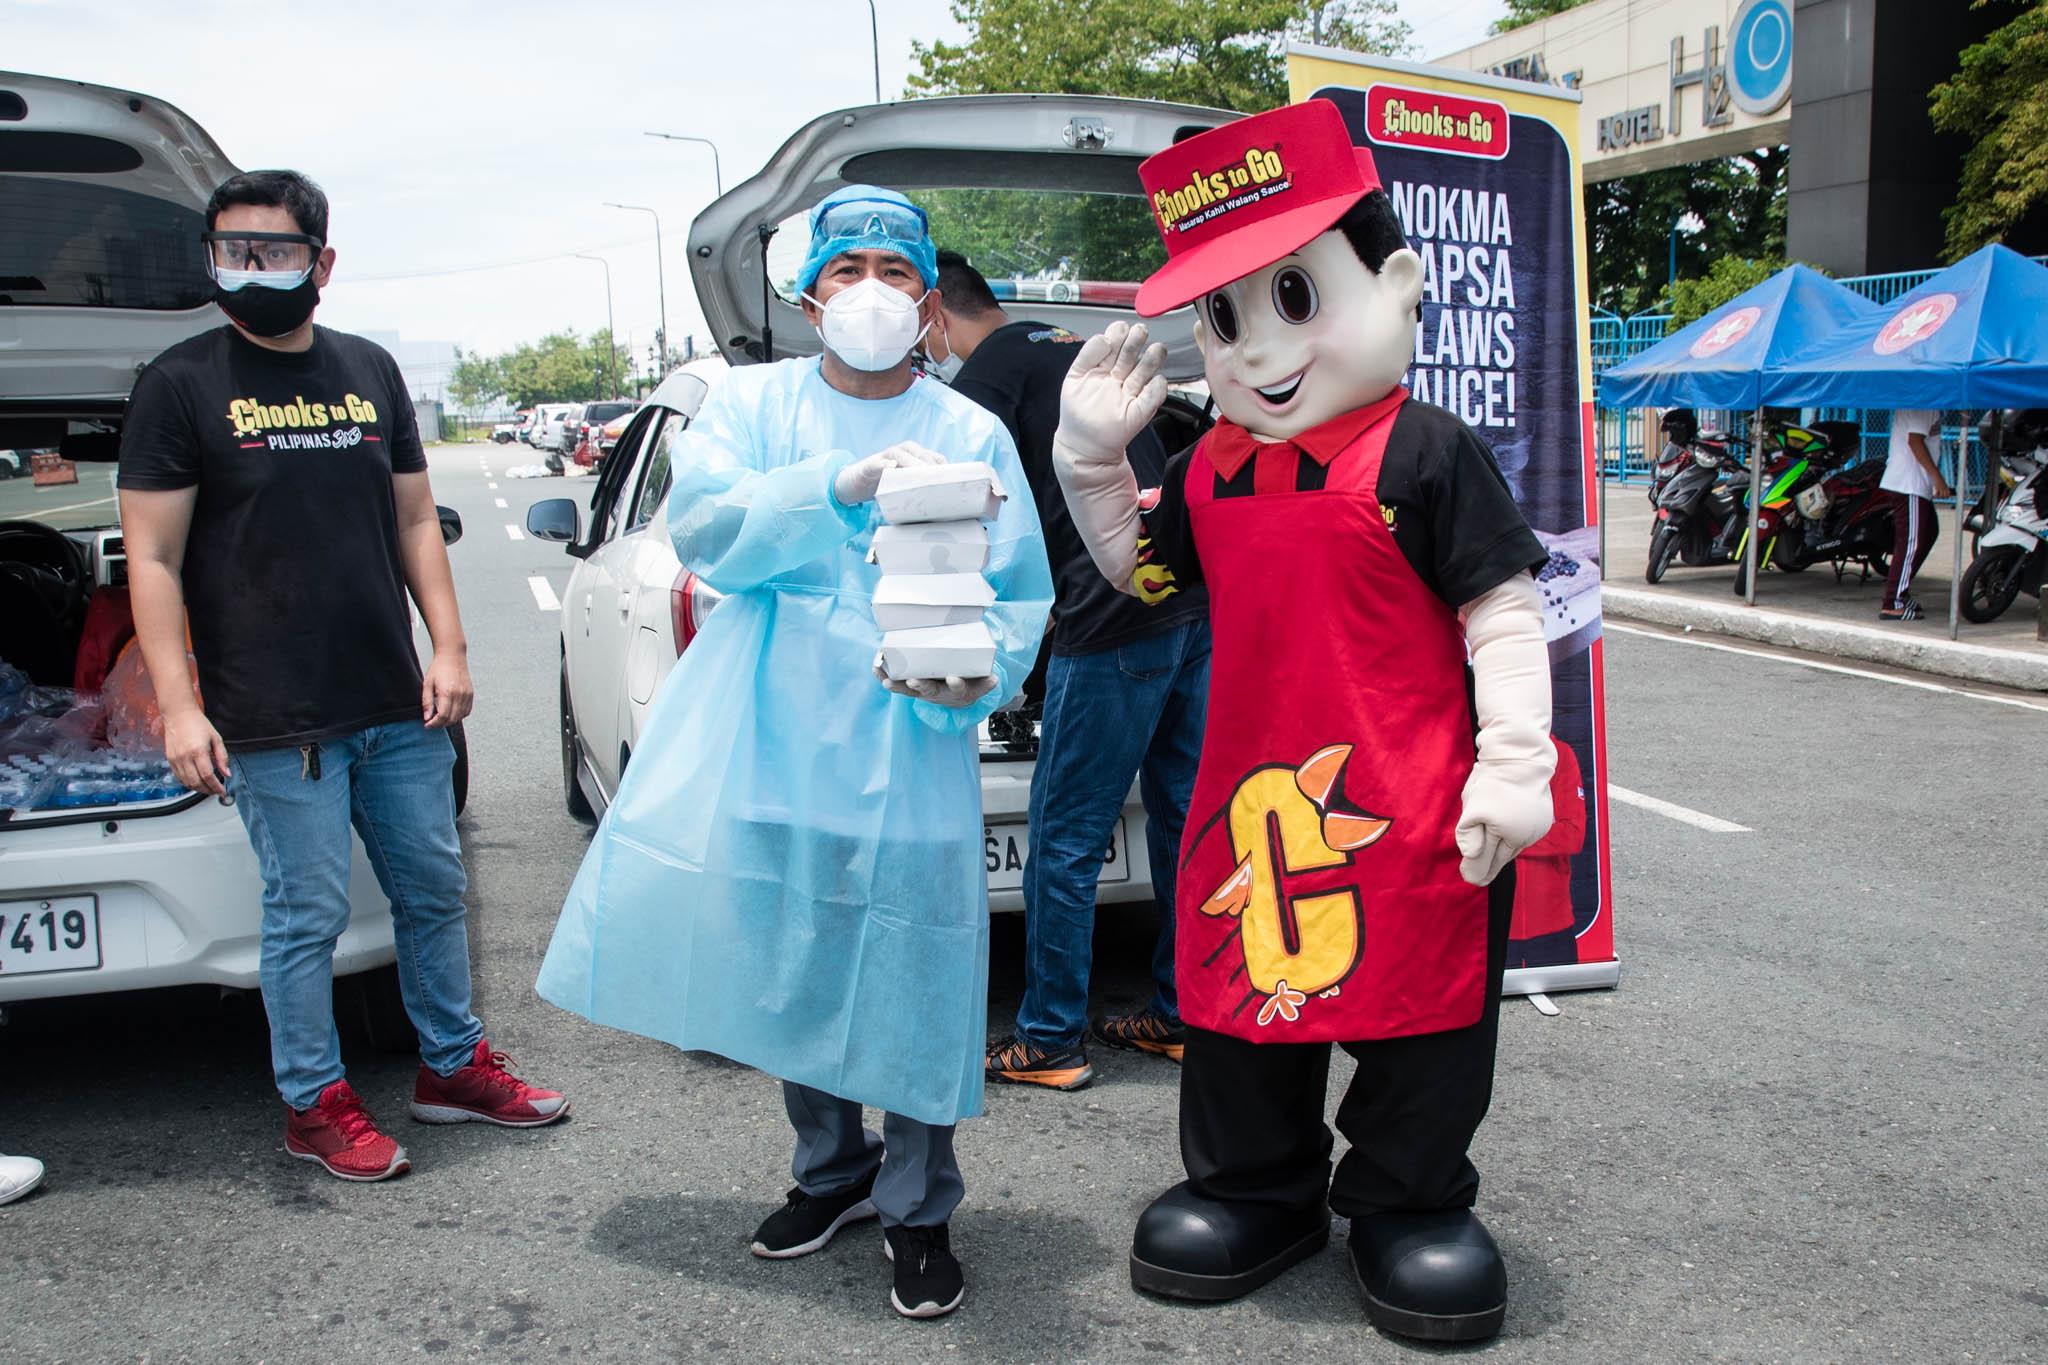 Tiebreaker Times Chooks-to-Go gives back to Manila drive-thru rapid testing frontliners Chooks-to-Go Pilipinas 3x3 News  Ronald Mascarinas Isko Moreno Coronavirus Pandemic